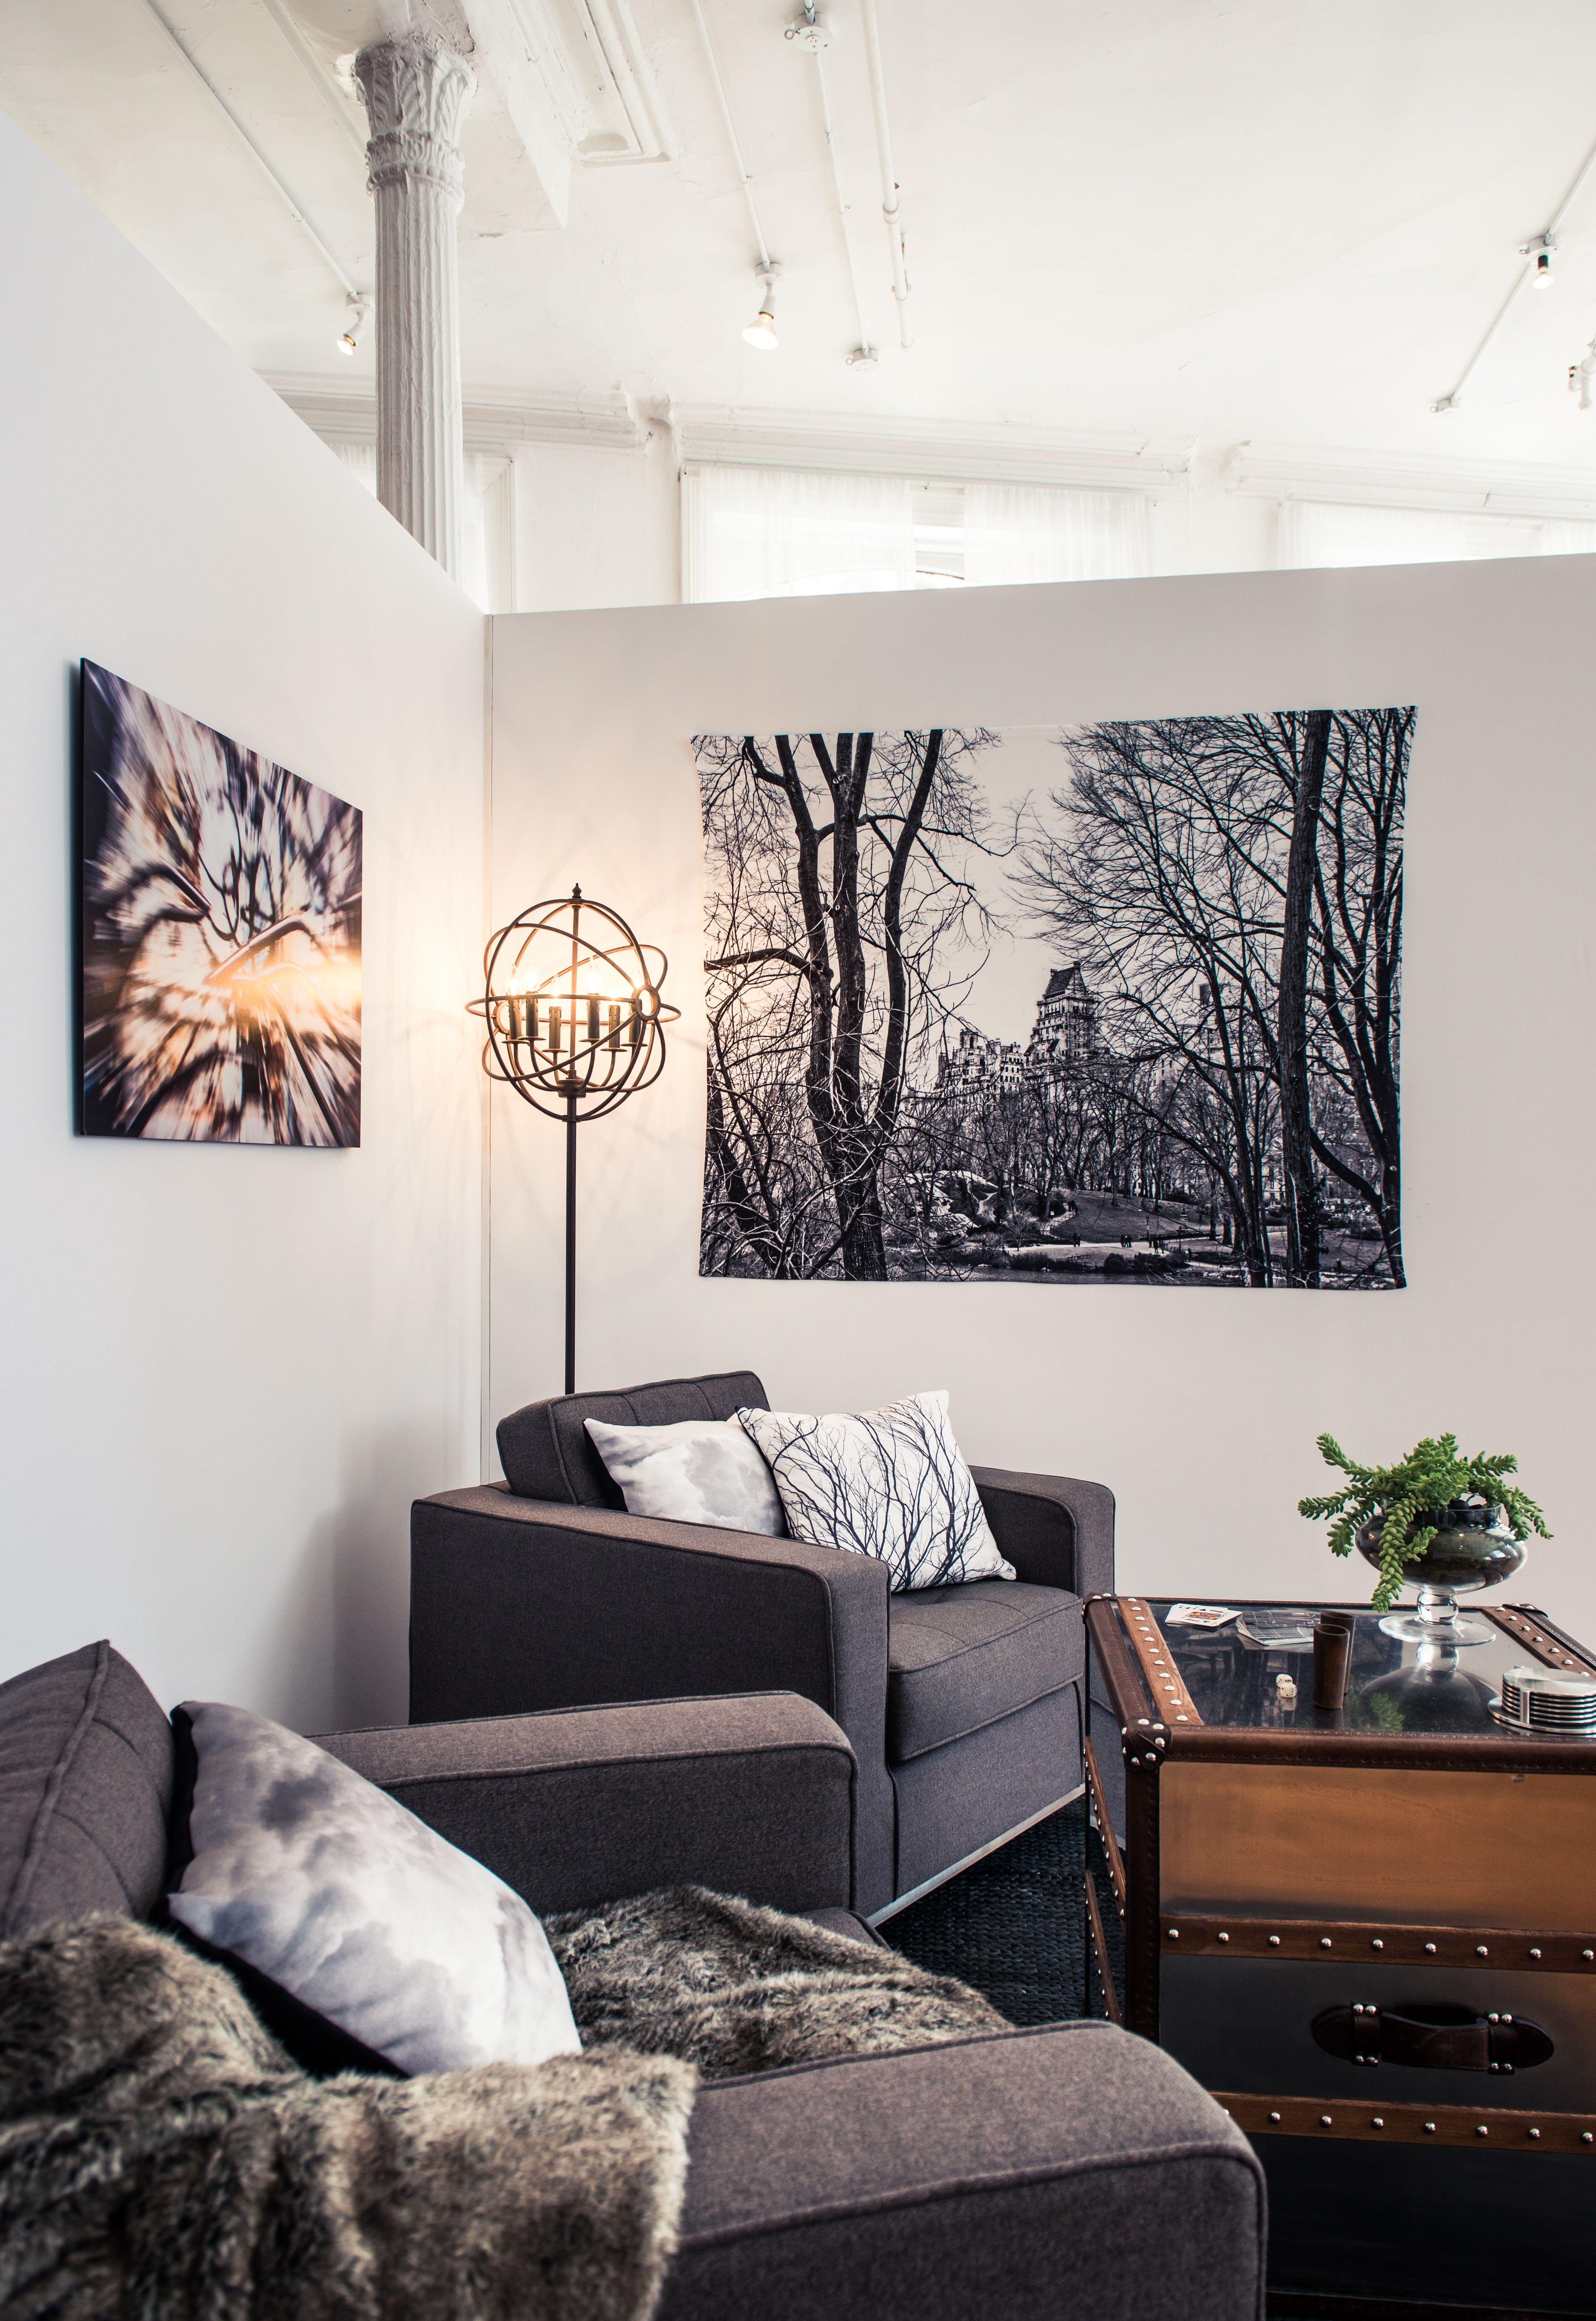 Mounted Wall Art Photo Wall Art Mounted Wall Prints Shutterfly White Home Decor Decor Home Decor